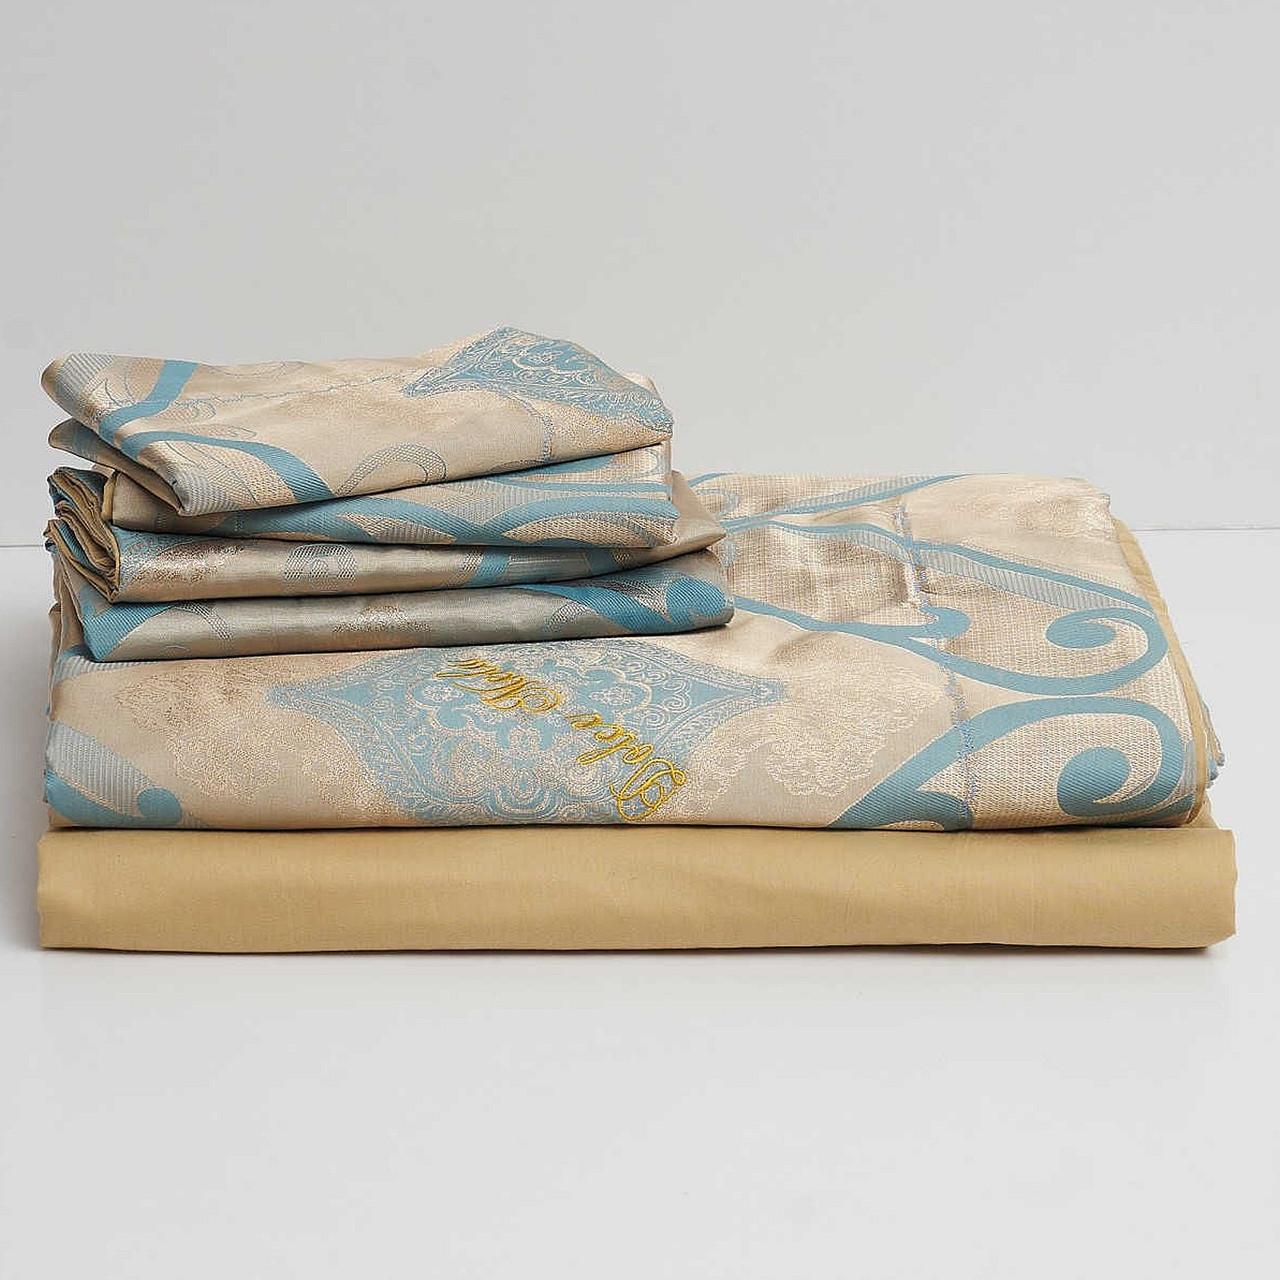 Bed-in-a-Bag for Drop-shipping Jacquard Duvet Cover Set DM804K